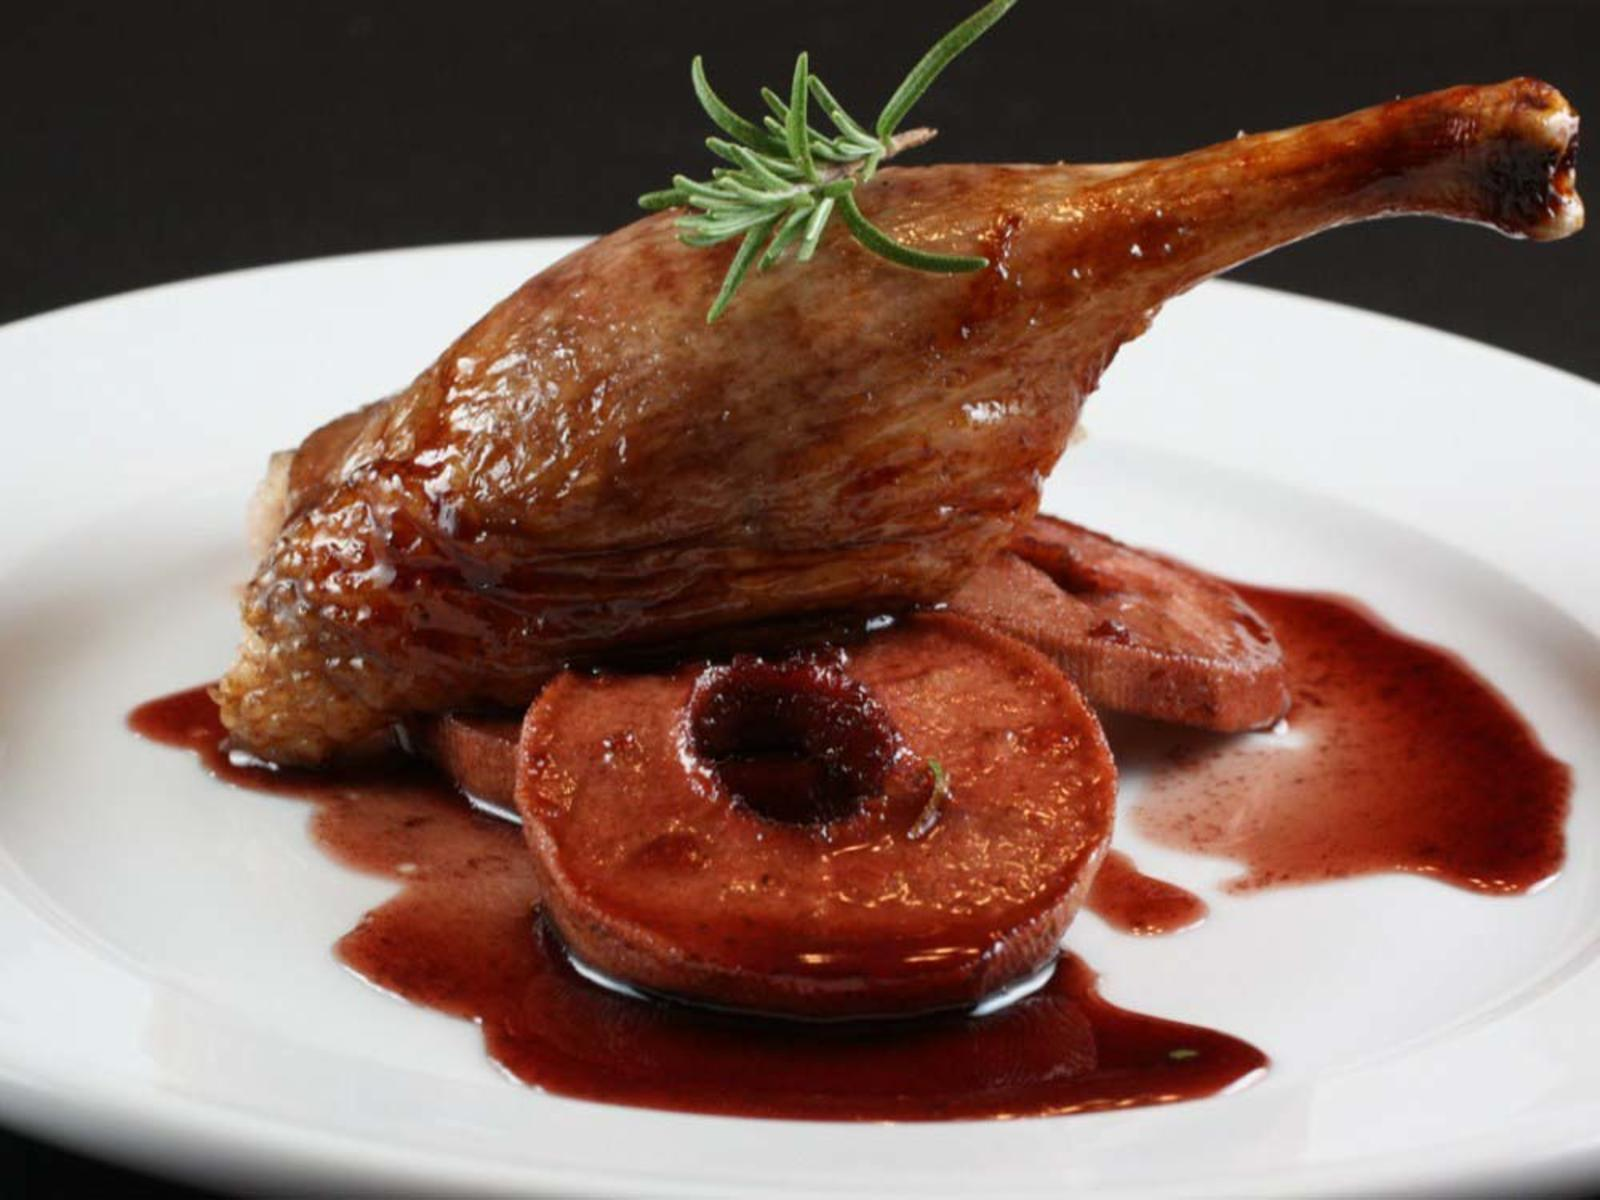 положено курица по бургундски рецепт с фото дизайна